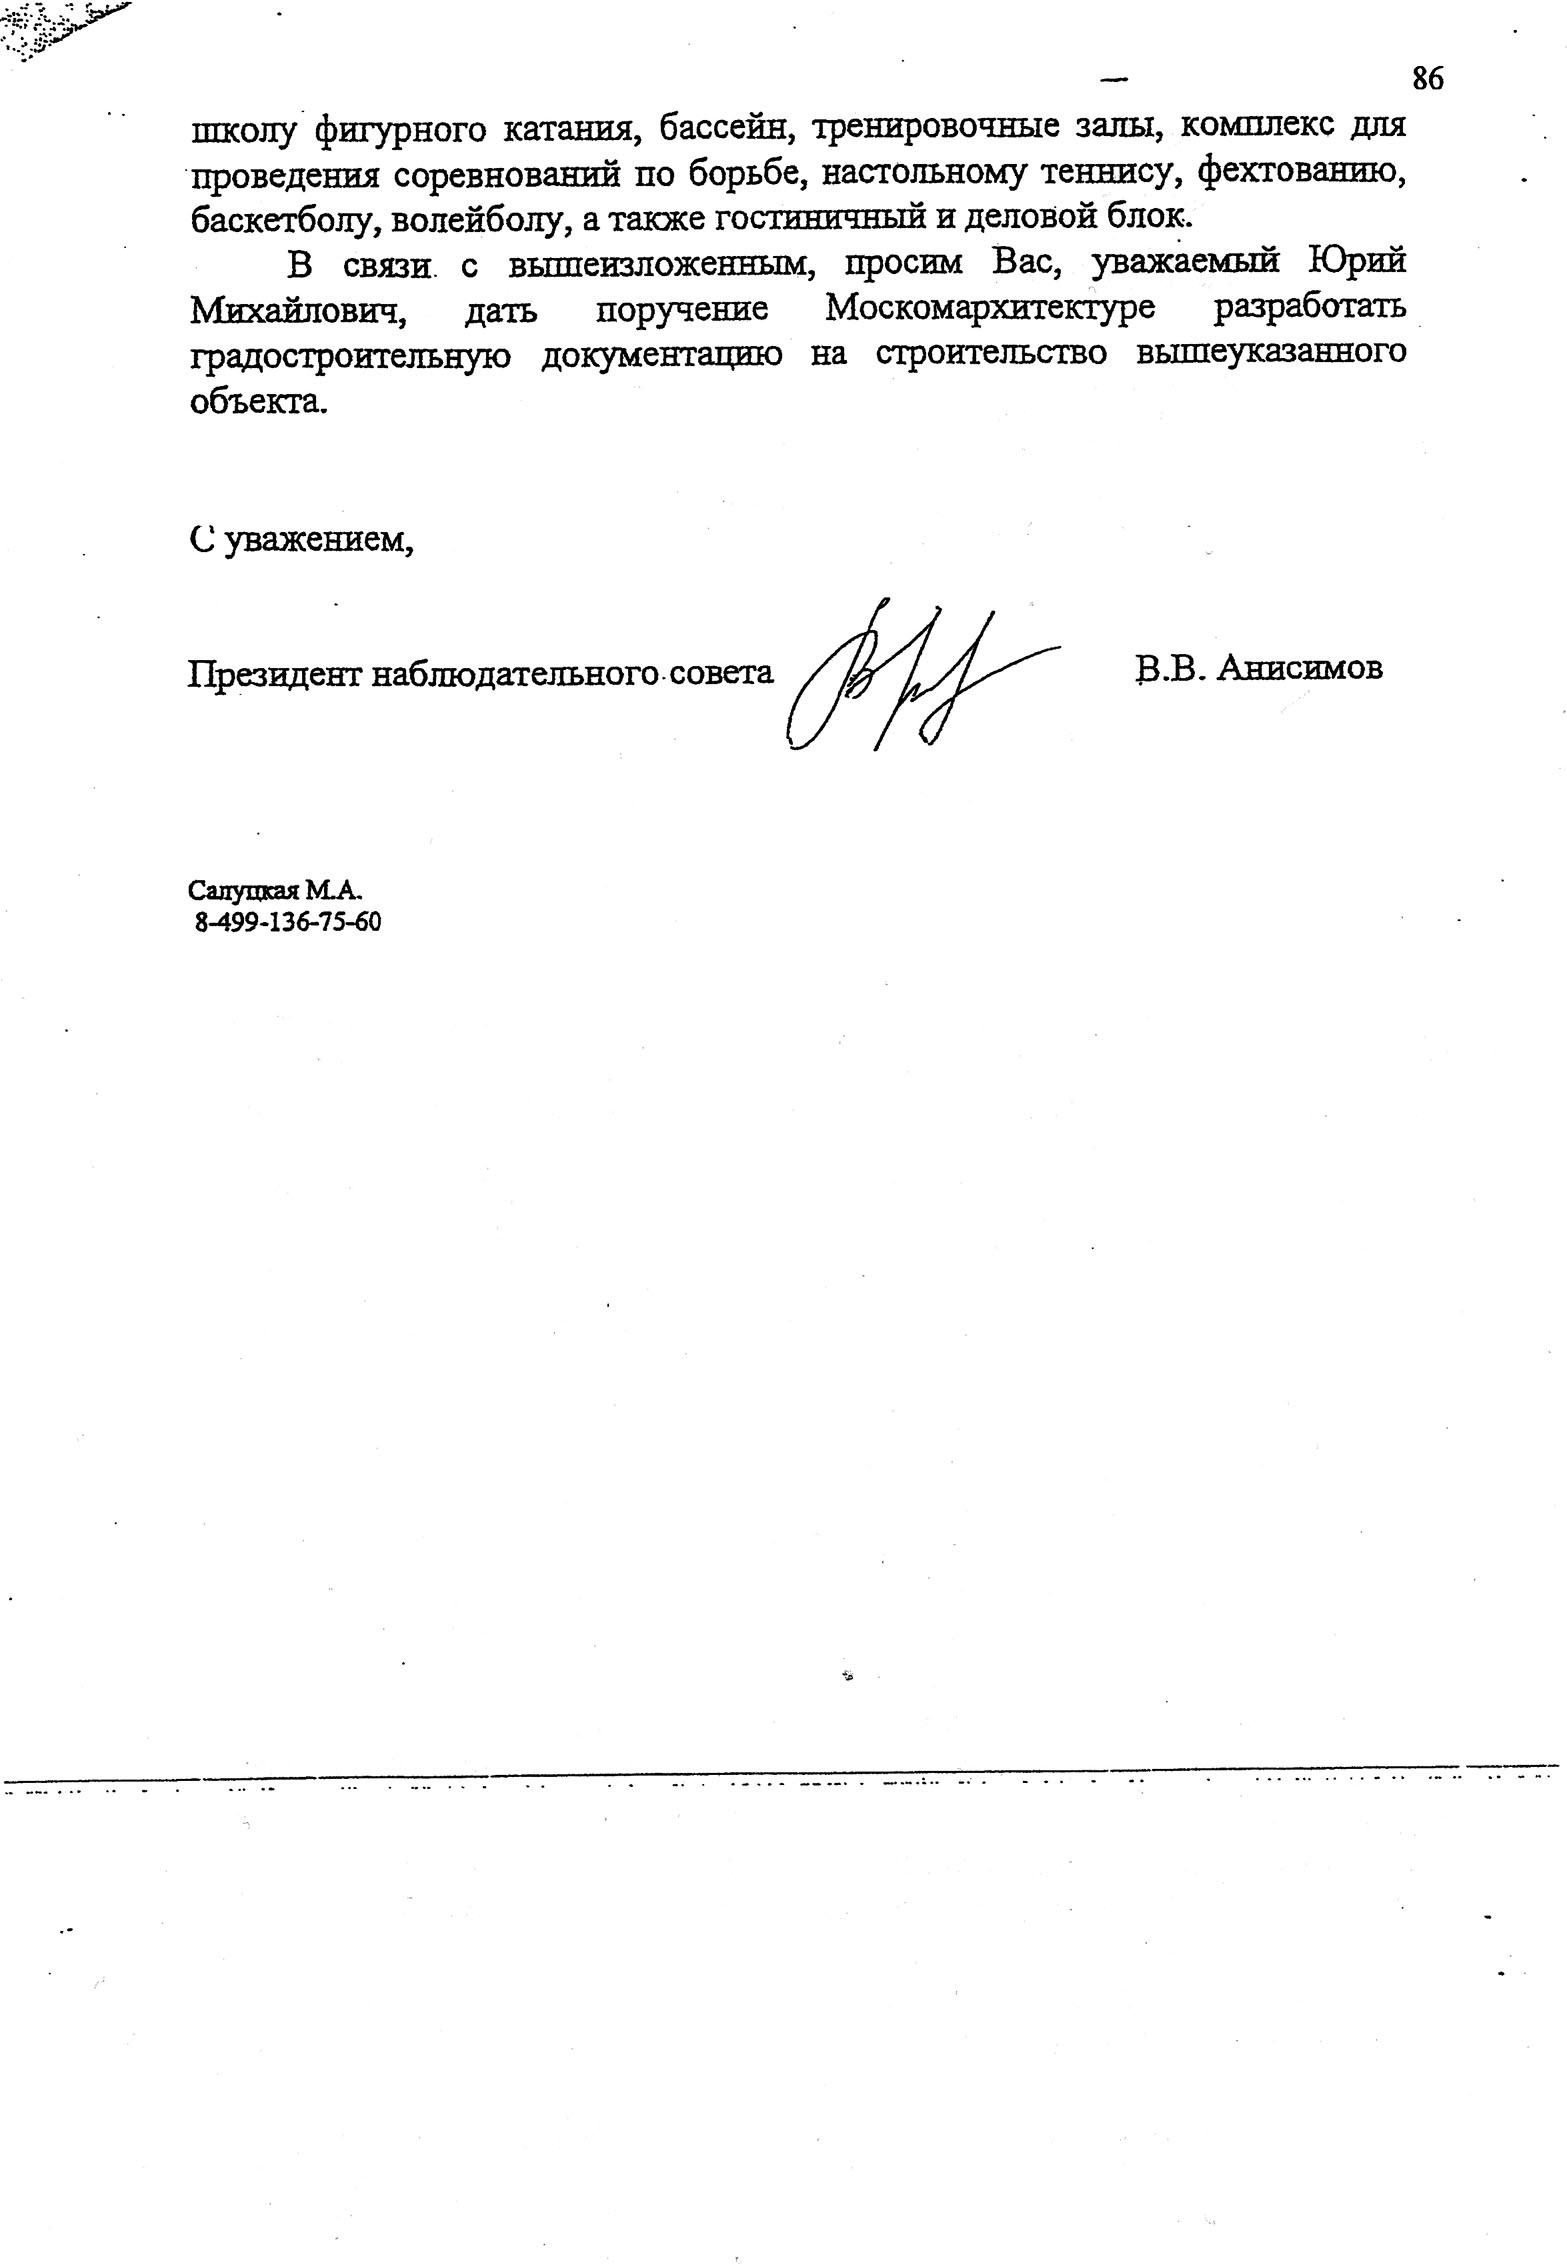 Pismo Anisimov 2s.jpg